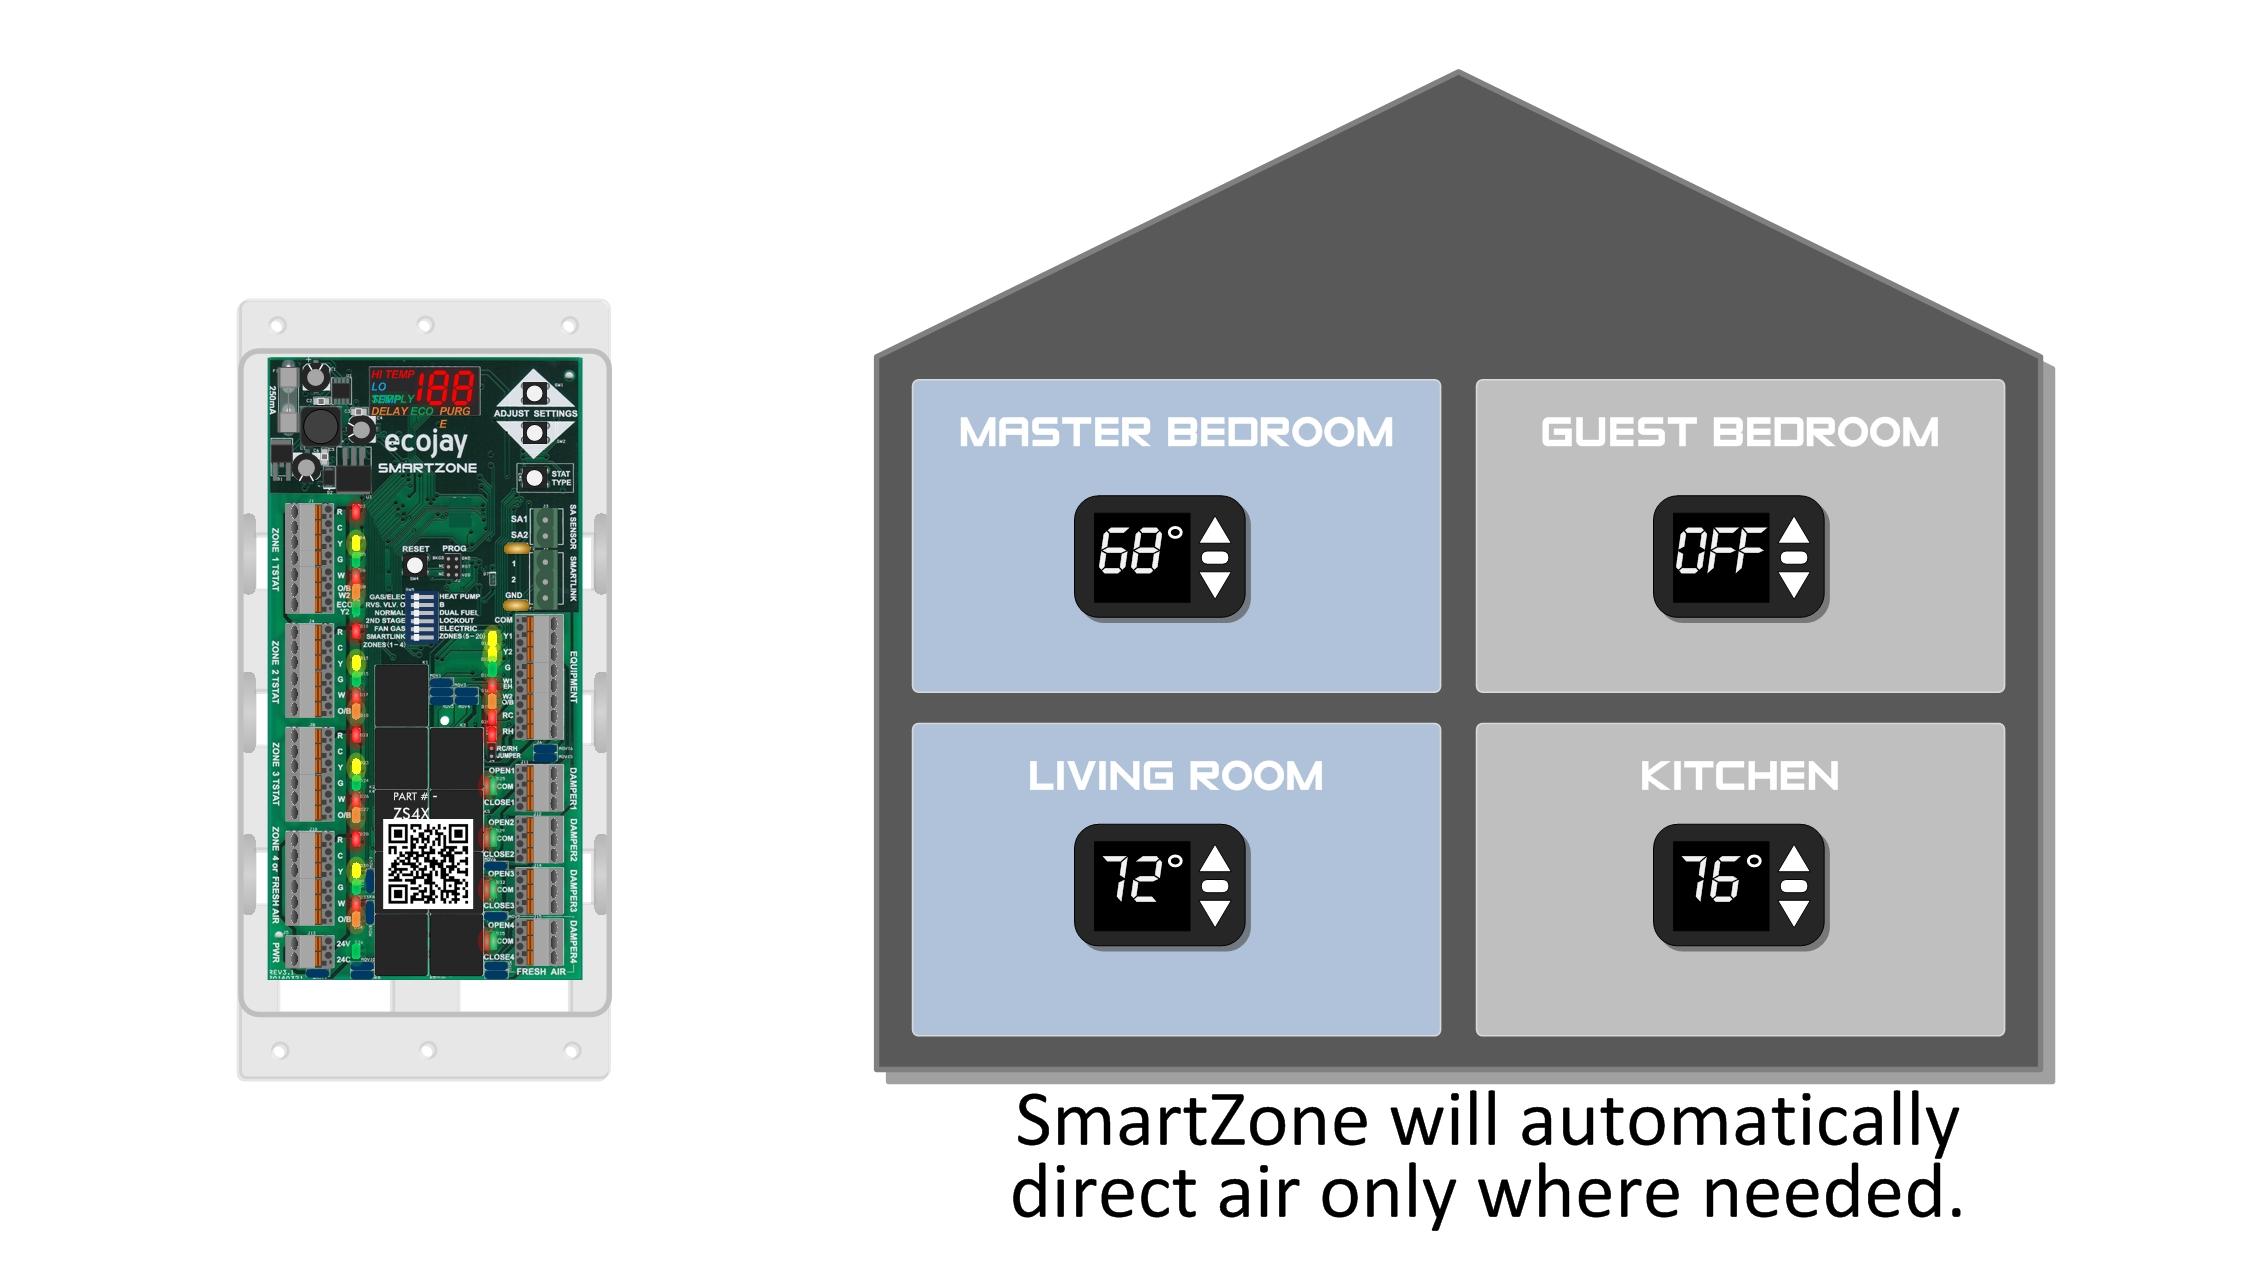 07 howitworks ecojay smartzone.jpg